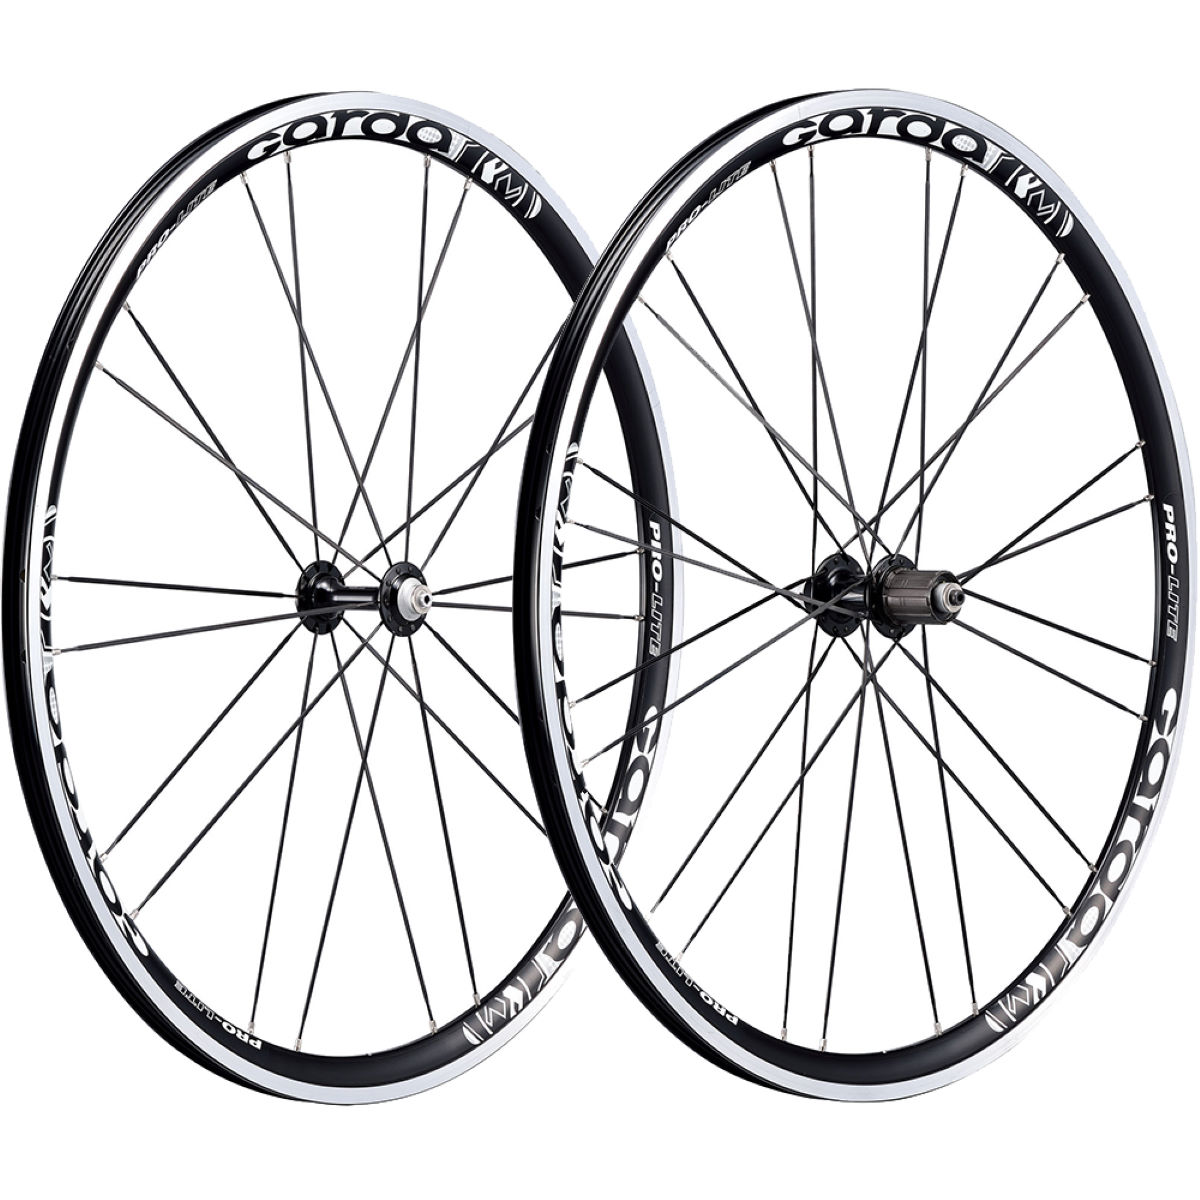 Pro Lite Garda DS 650C Alloy Clincher Wheelset Performance Wheels